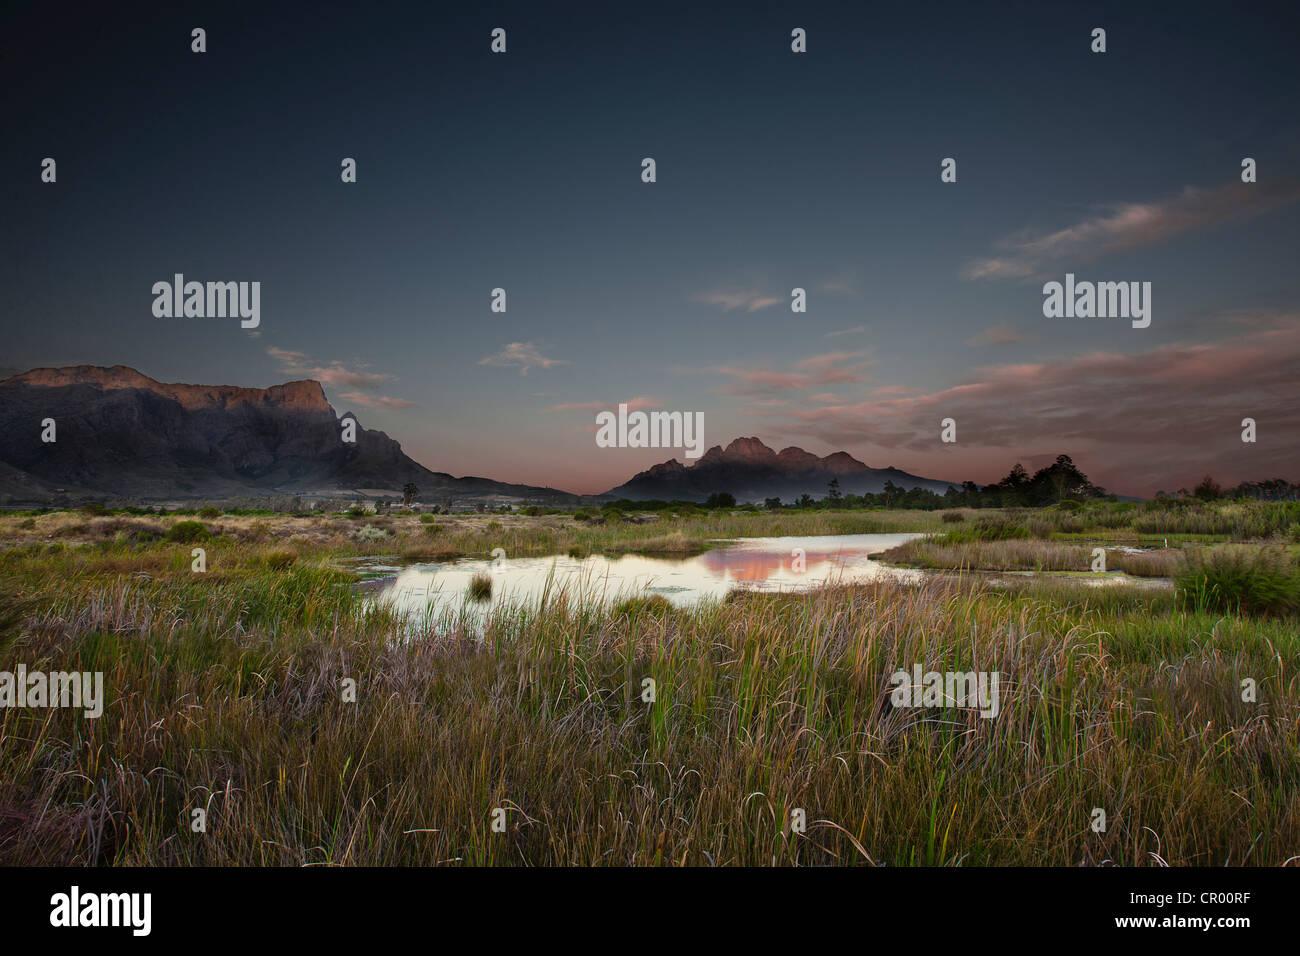 Still lake in rural landscape - Stock Image